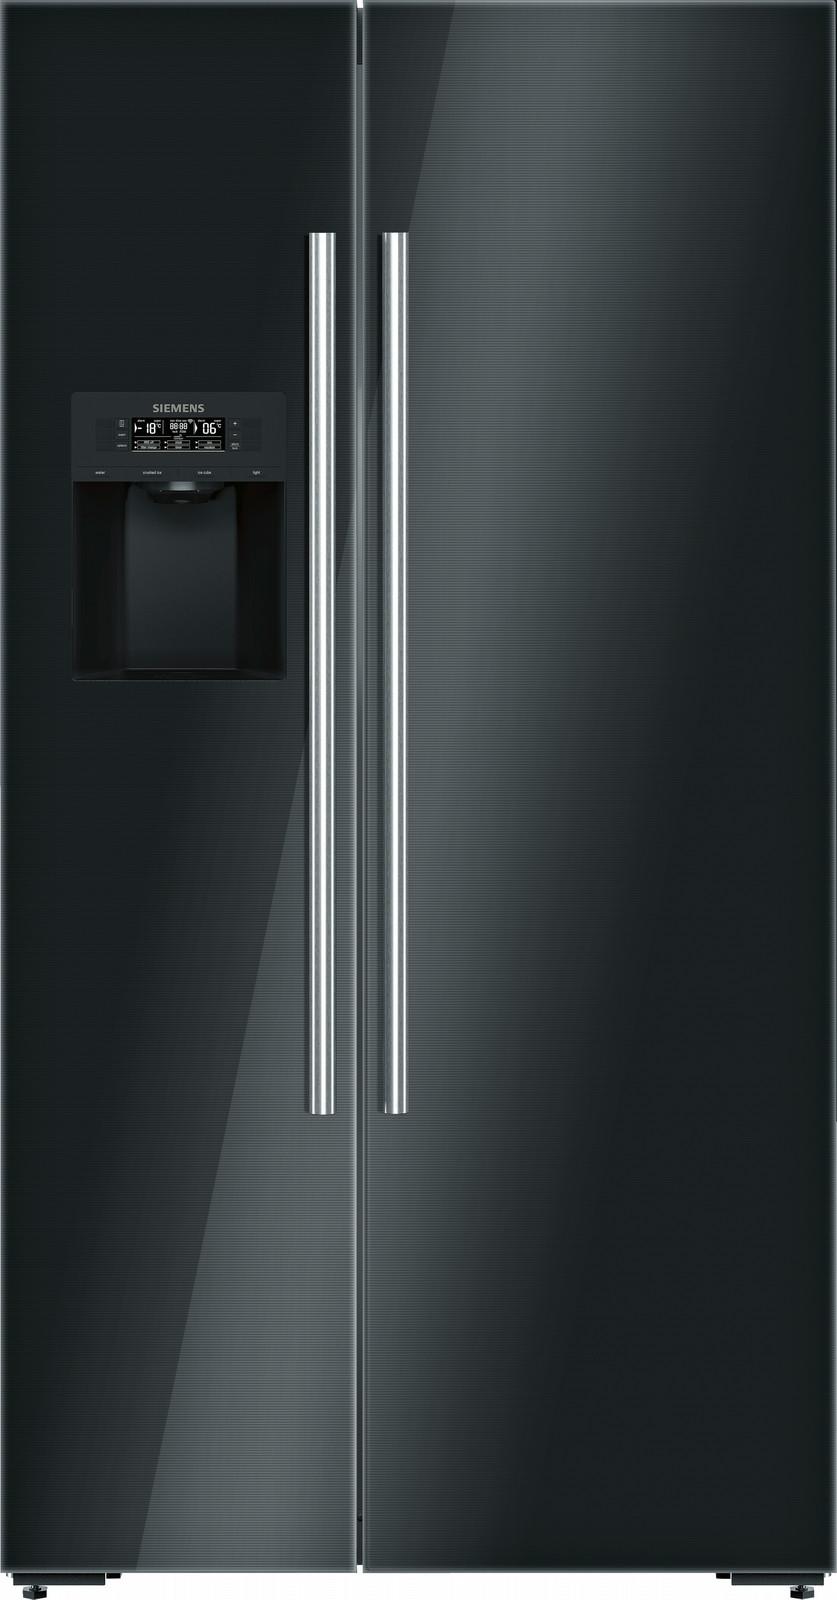 ᐈ Siemens Ka92dsb30 Best Price Technical Specifications